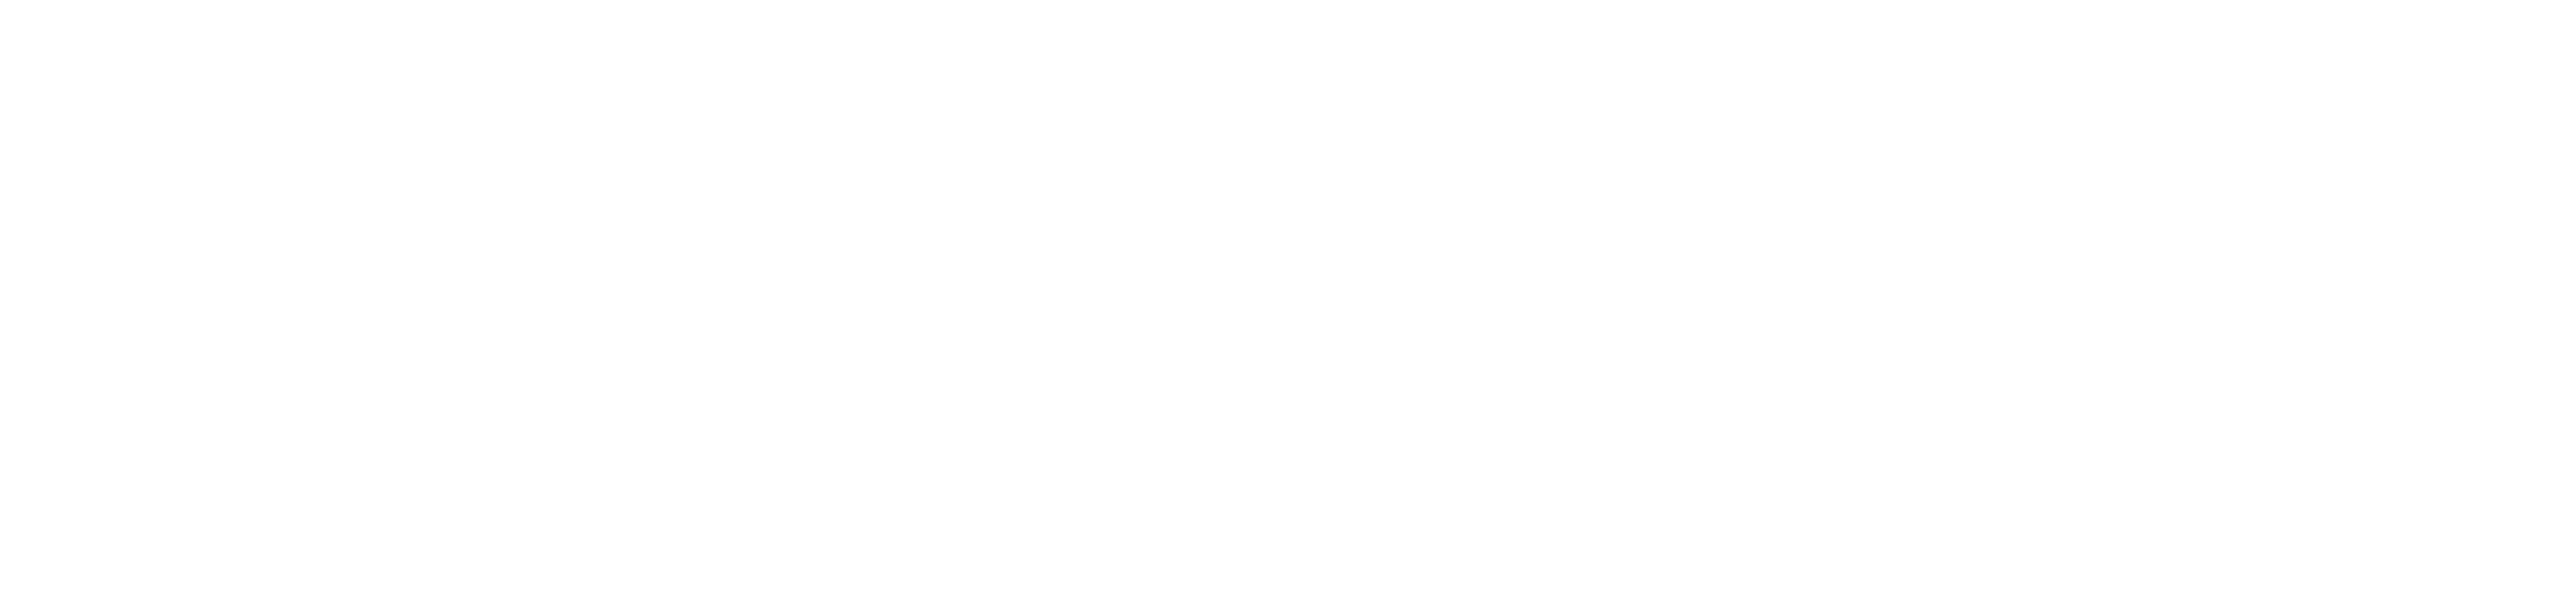 Edwin Gonzalez Multimedia